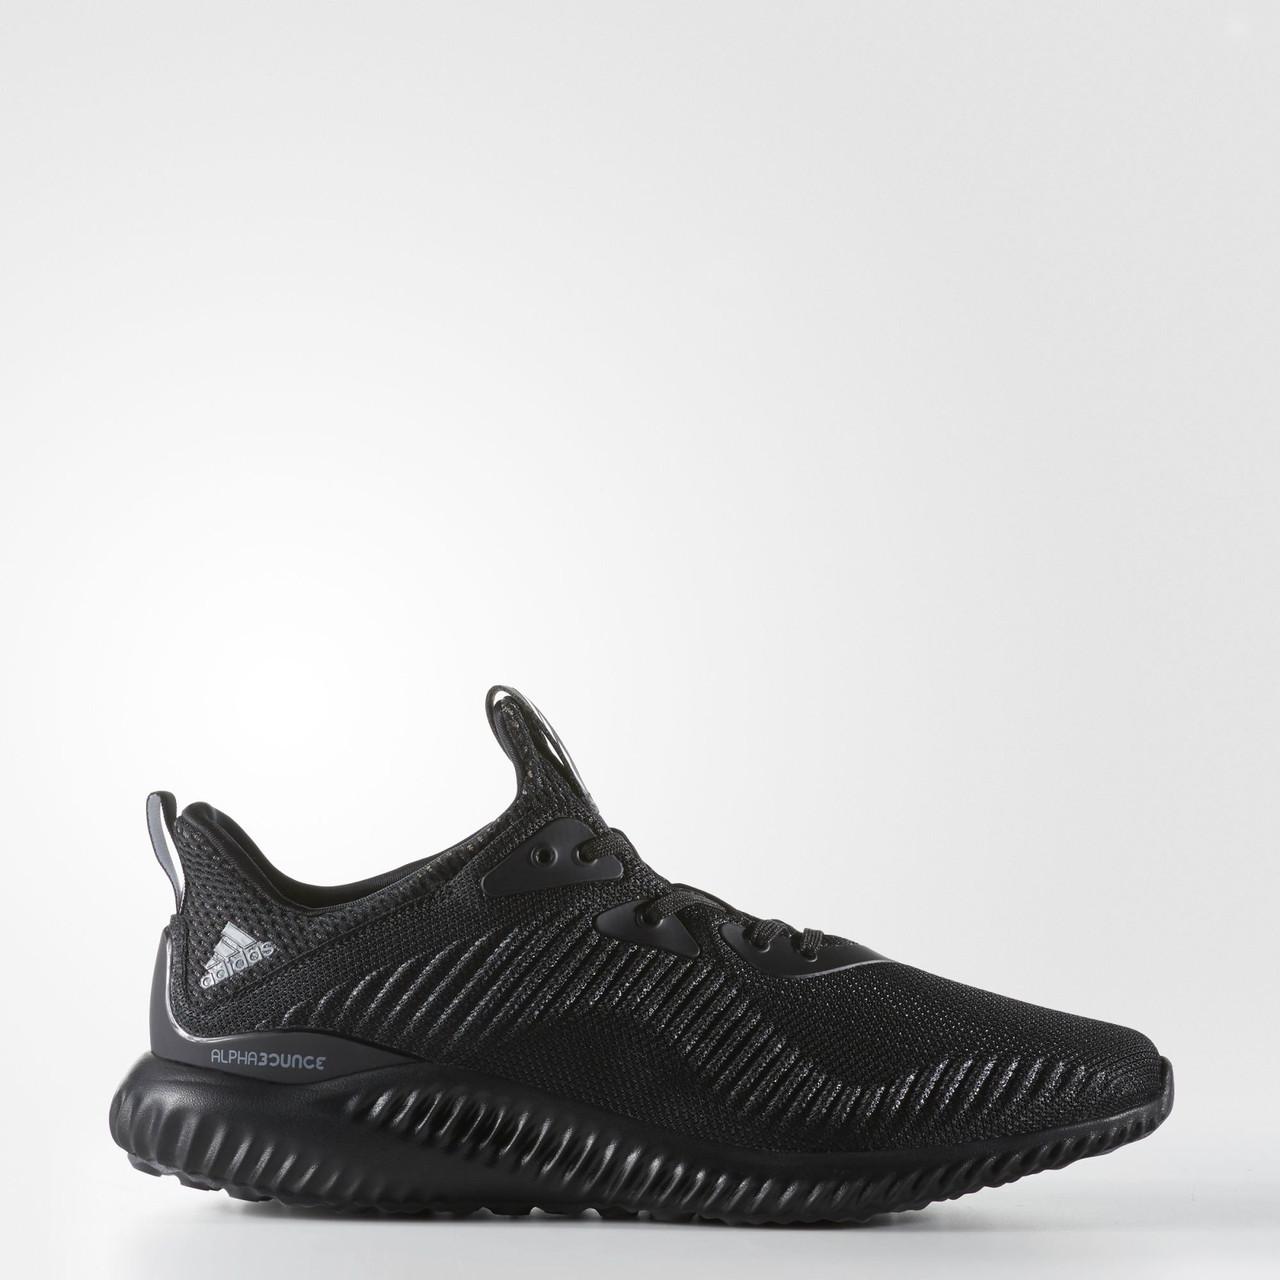 2b42bc9be891 Мужские кроссовки Adidas Performance Alphabounce (Артикул  BW0539) -  Интернет-магазин «Эксперт